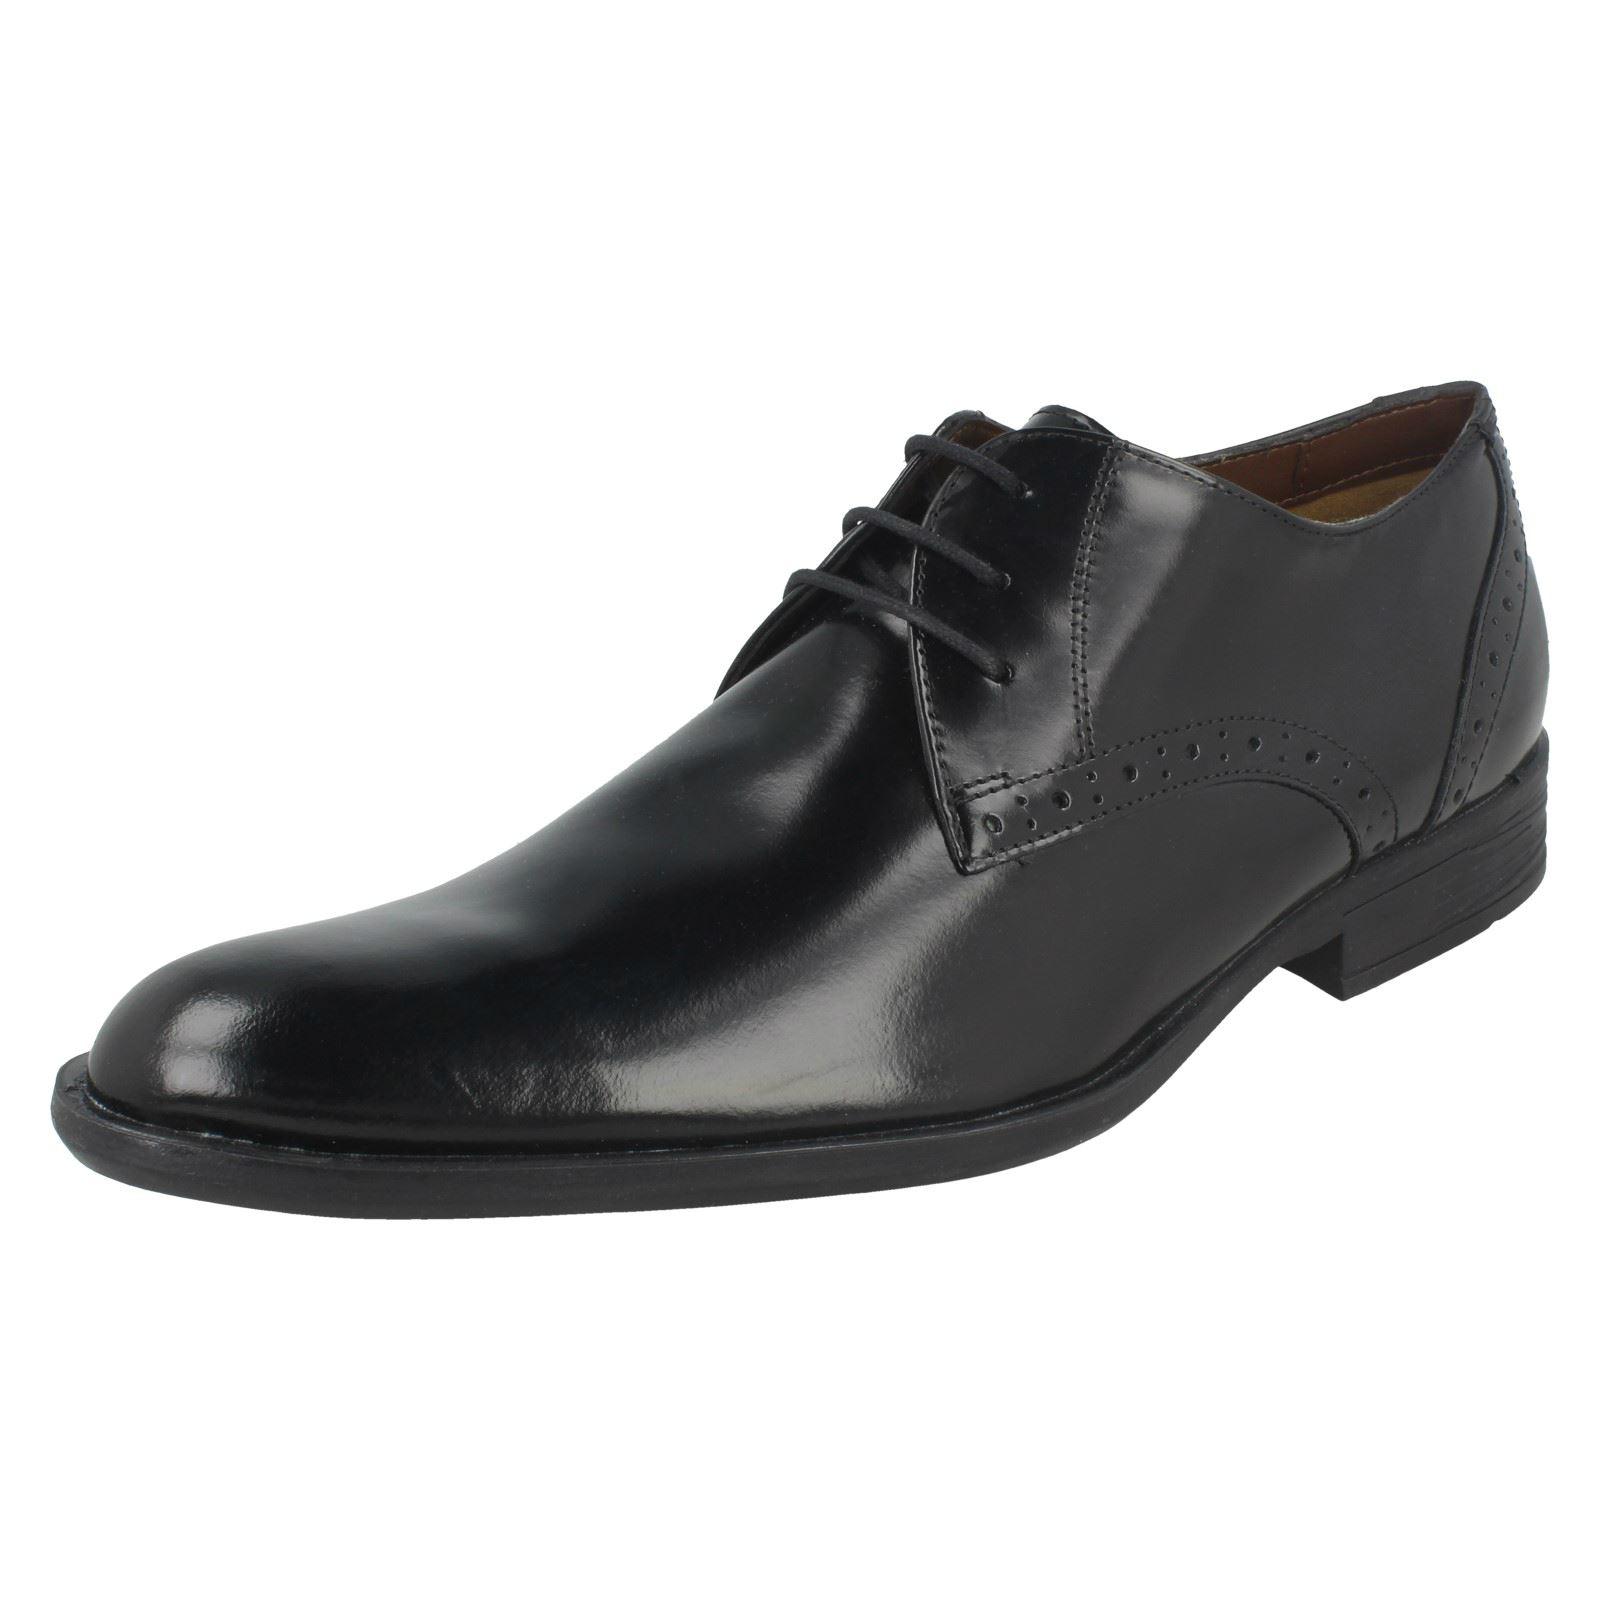 564d21a3cb3 Hombre Hush Puppies Zapatos de Vestir con Cordones  Kensington